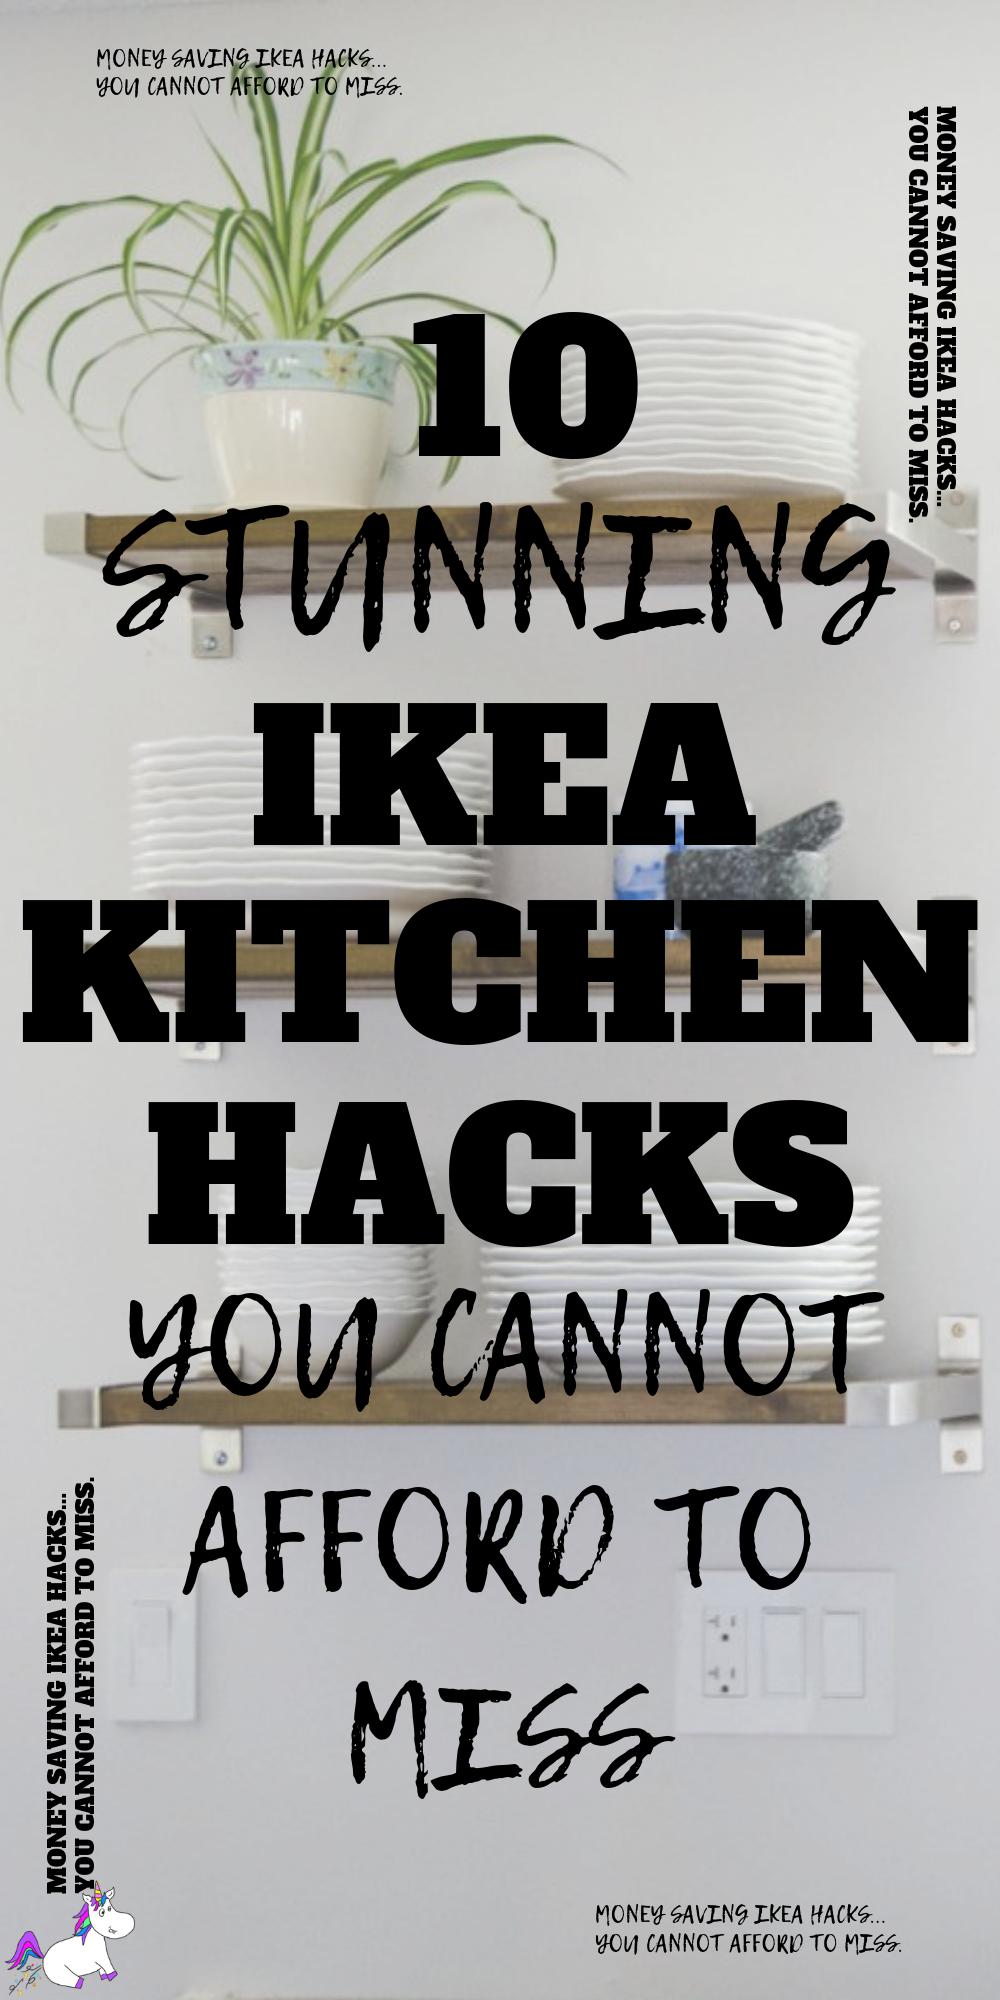 10 Stunning Ikea Kitchen Hacks You Cannot Afford To Miss   kitchen home decor   Home decor on a budget   Ikea kitchen   Via: https://themummyfront.com #themummyfront #ikeakitchenhacks #ikeahacks #homedecoronabudget #creativehomedecor